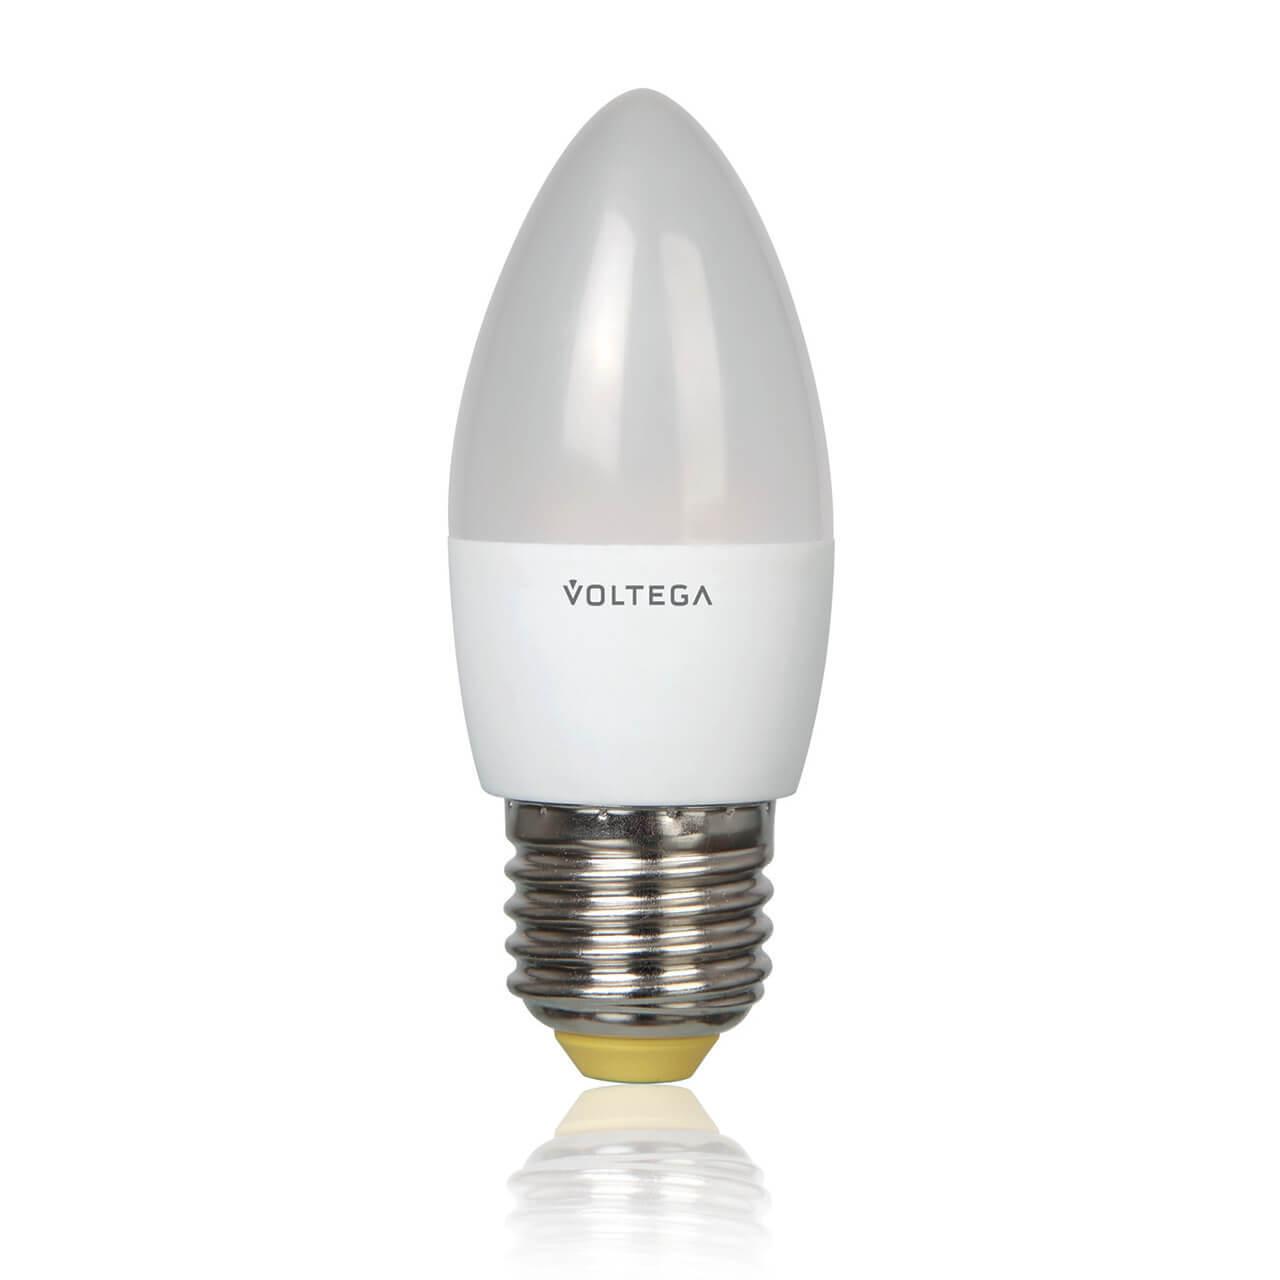 Лампа светодиодная Voltega E27 5.4W 4000К матовая VG4-C2E27cold5W 5744 voltega лампа светодиодная voltega рефлектор матовый e14 5 4w 4000к vg4 rm2e14cold5w 5756